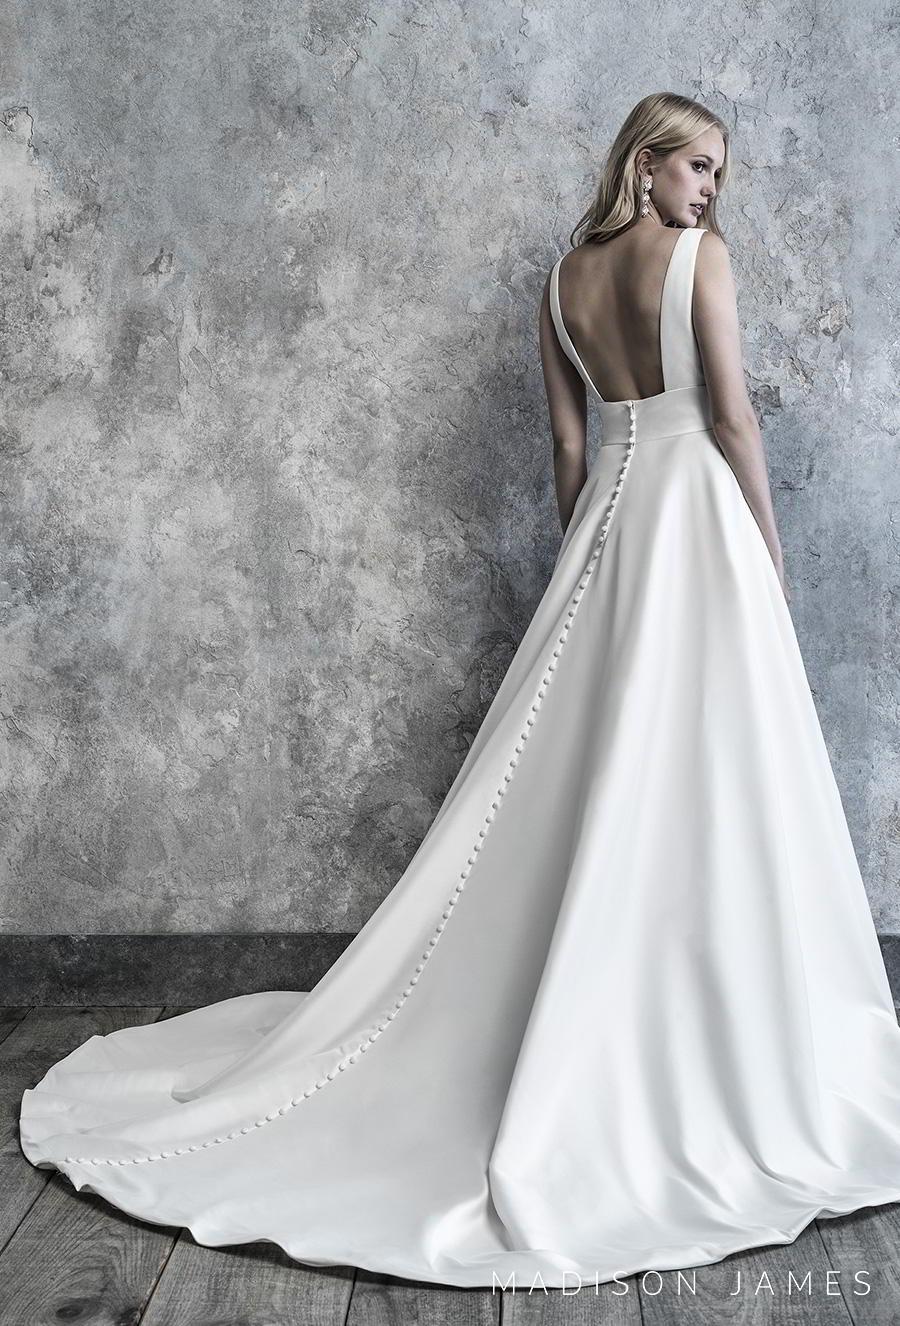 madison james 2019 bridal sleeveless deep v neck simple minimalist elegant a line wedding dress backless square back chapel train (501) bv